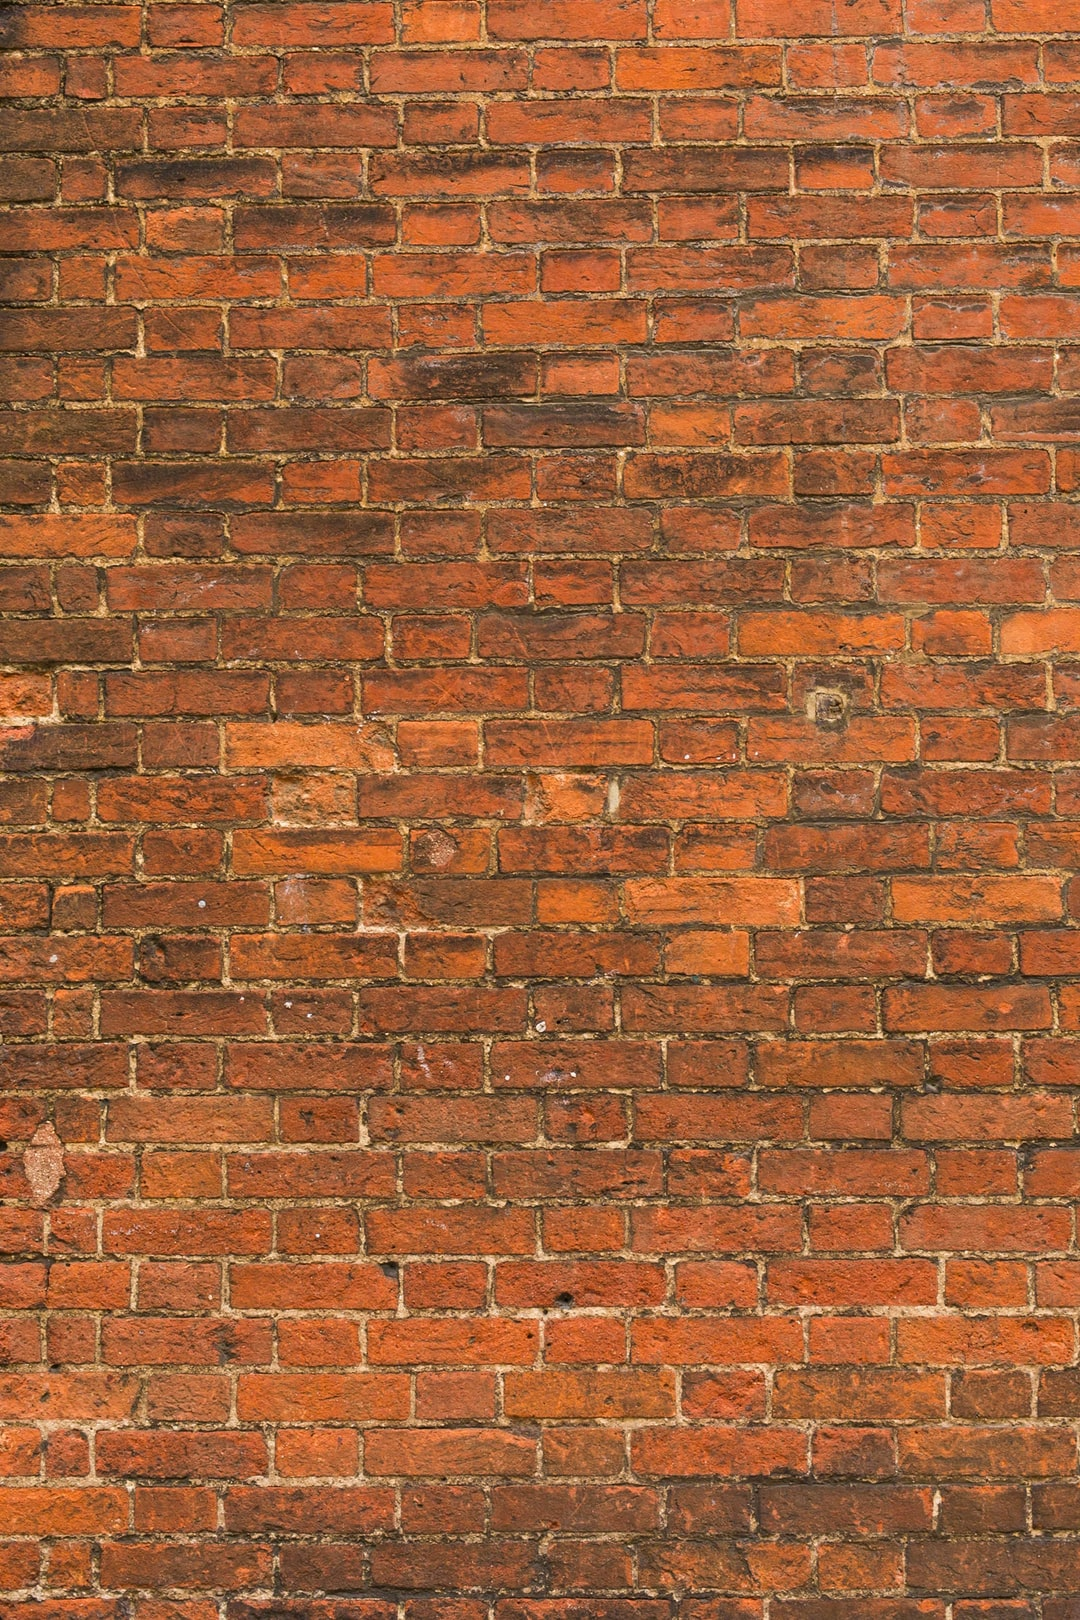 brown bricks wall photo u2013 Free Brick Image on Unsplash